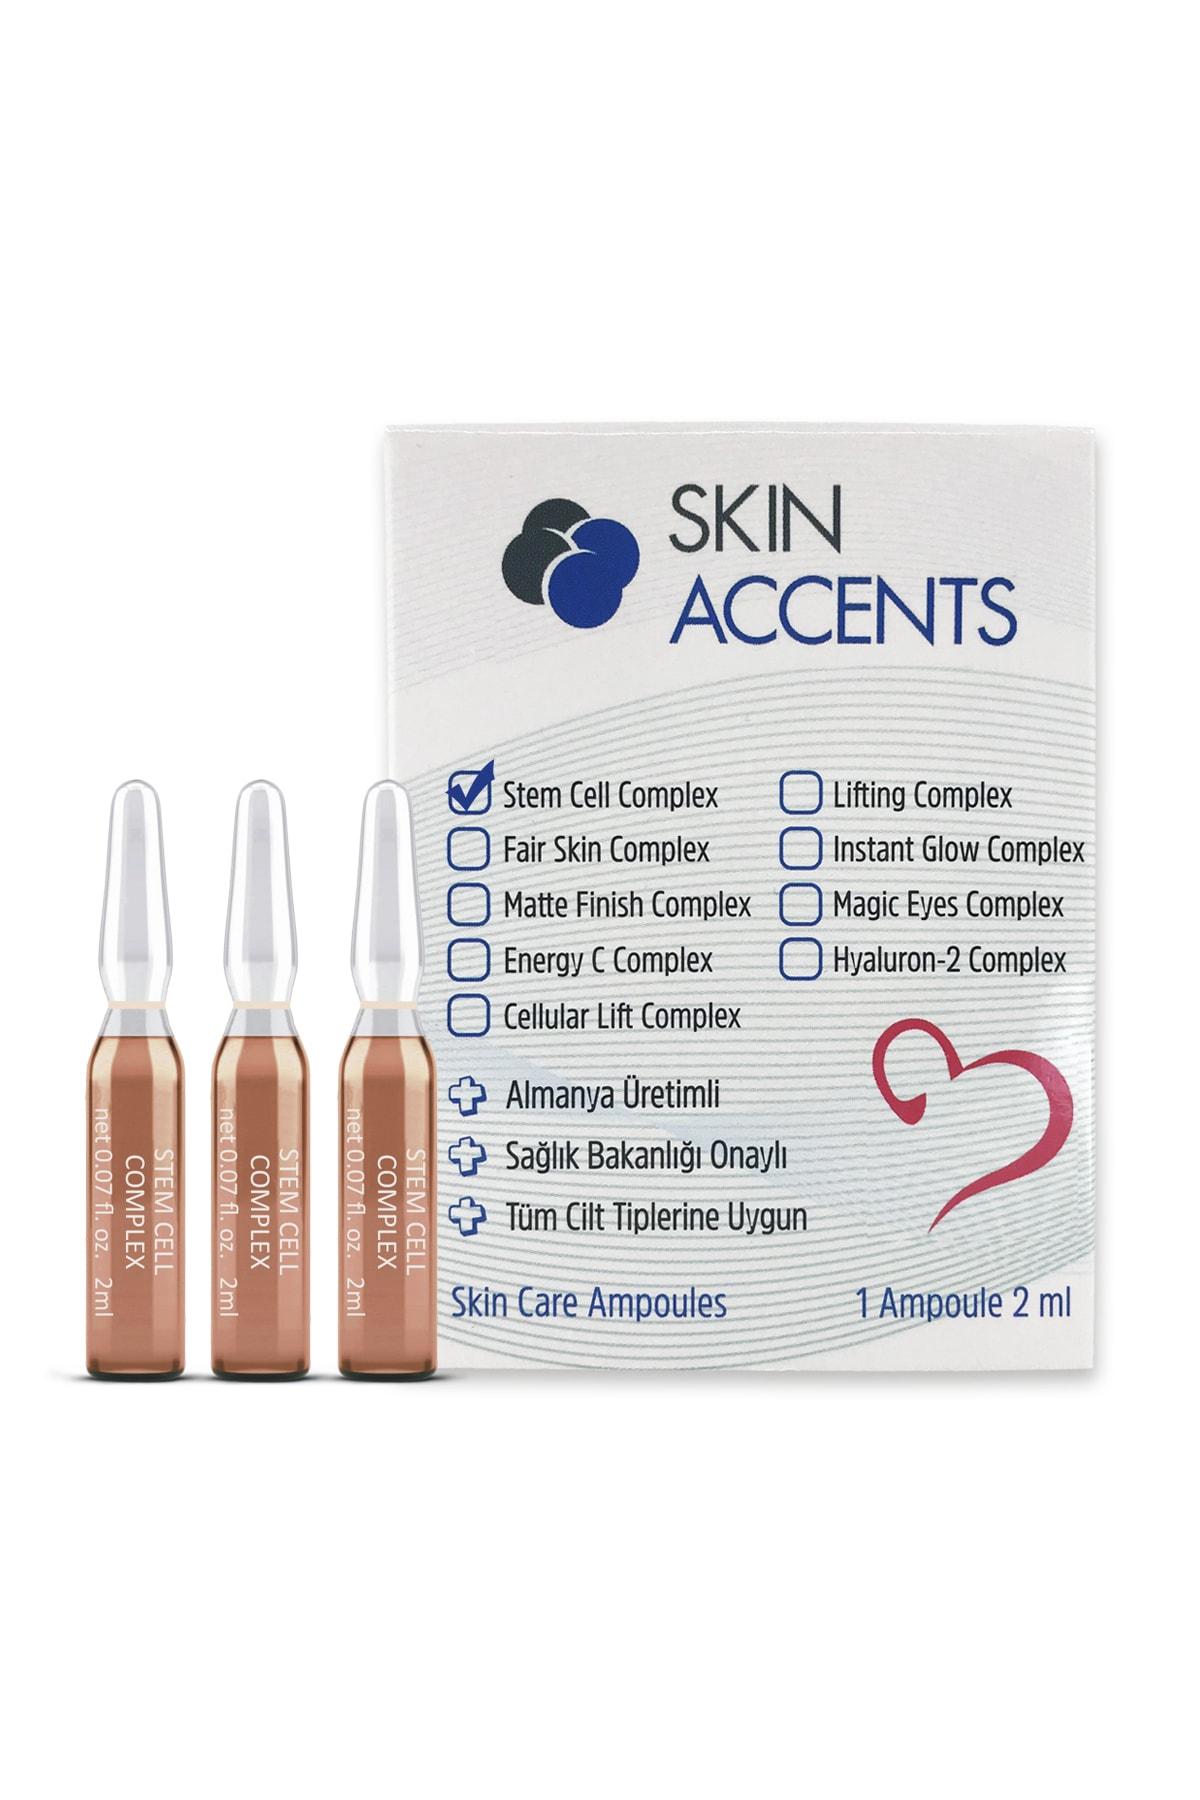 Skin Accents 3 Adet Kök Hücre Ampul Alman Serum Dermaroller Dermapen Cilt Bakım Serumu 1